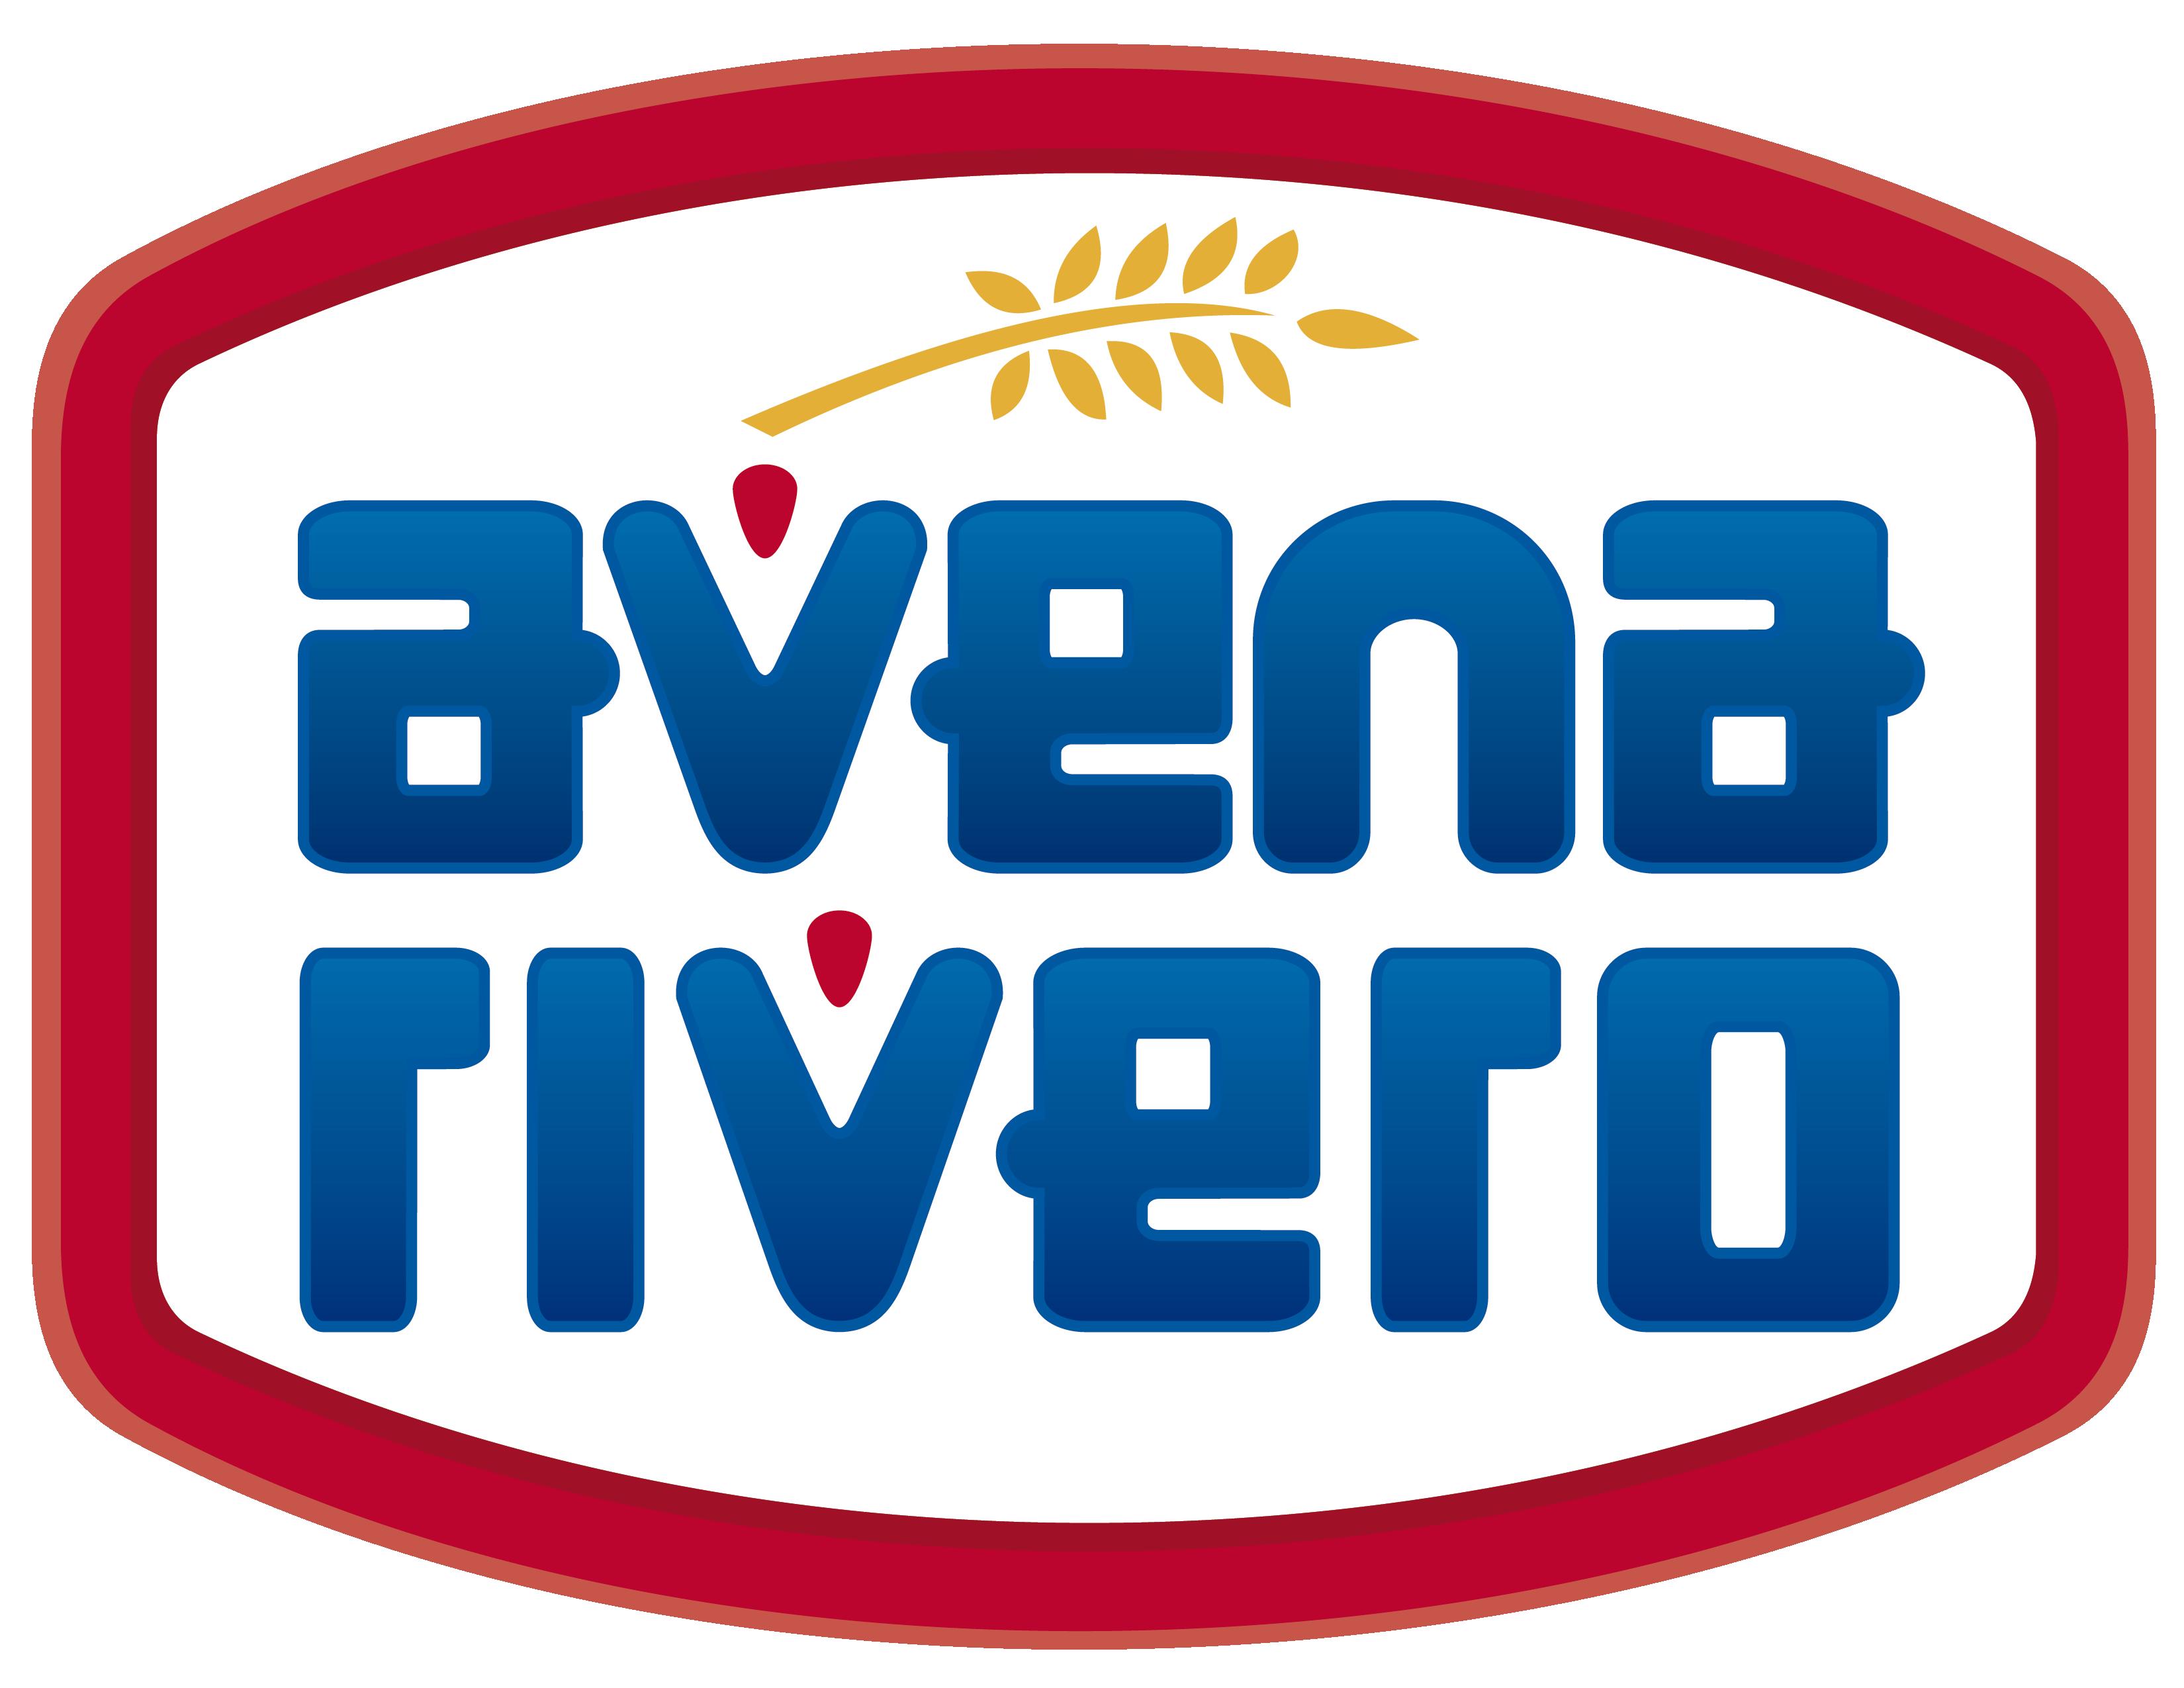 Avena Rivero